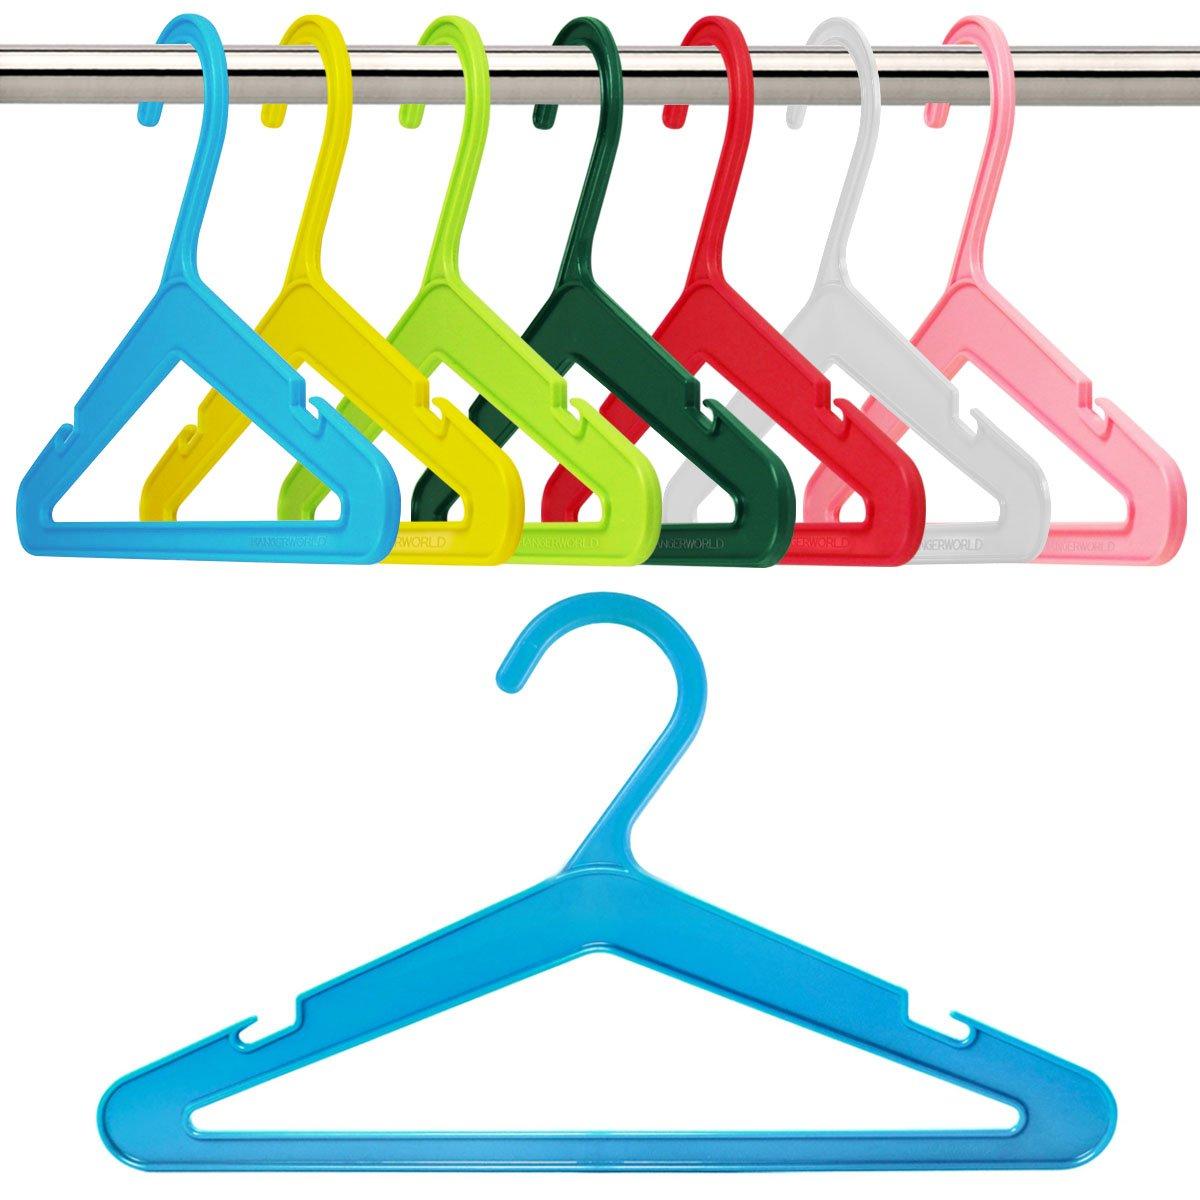 HANGERWORLD 50 Multi Colored 10inch Plastic Kids Baby Toddler Pants Bar Coat Garment Clothes Hangers PH-SWKIDS-MIX-50